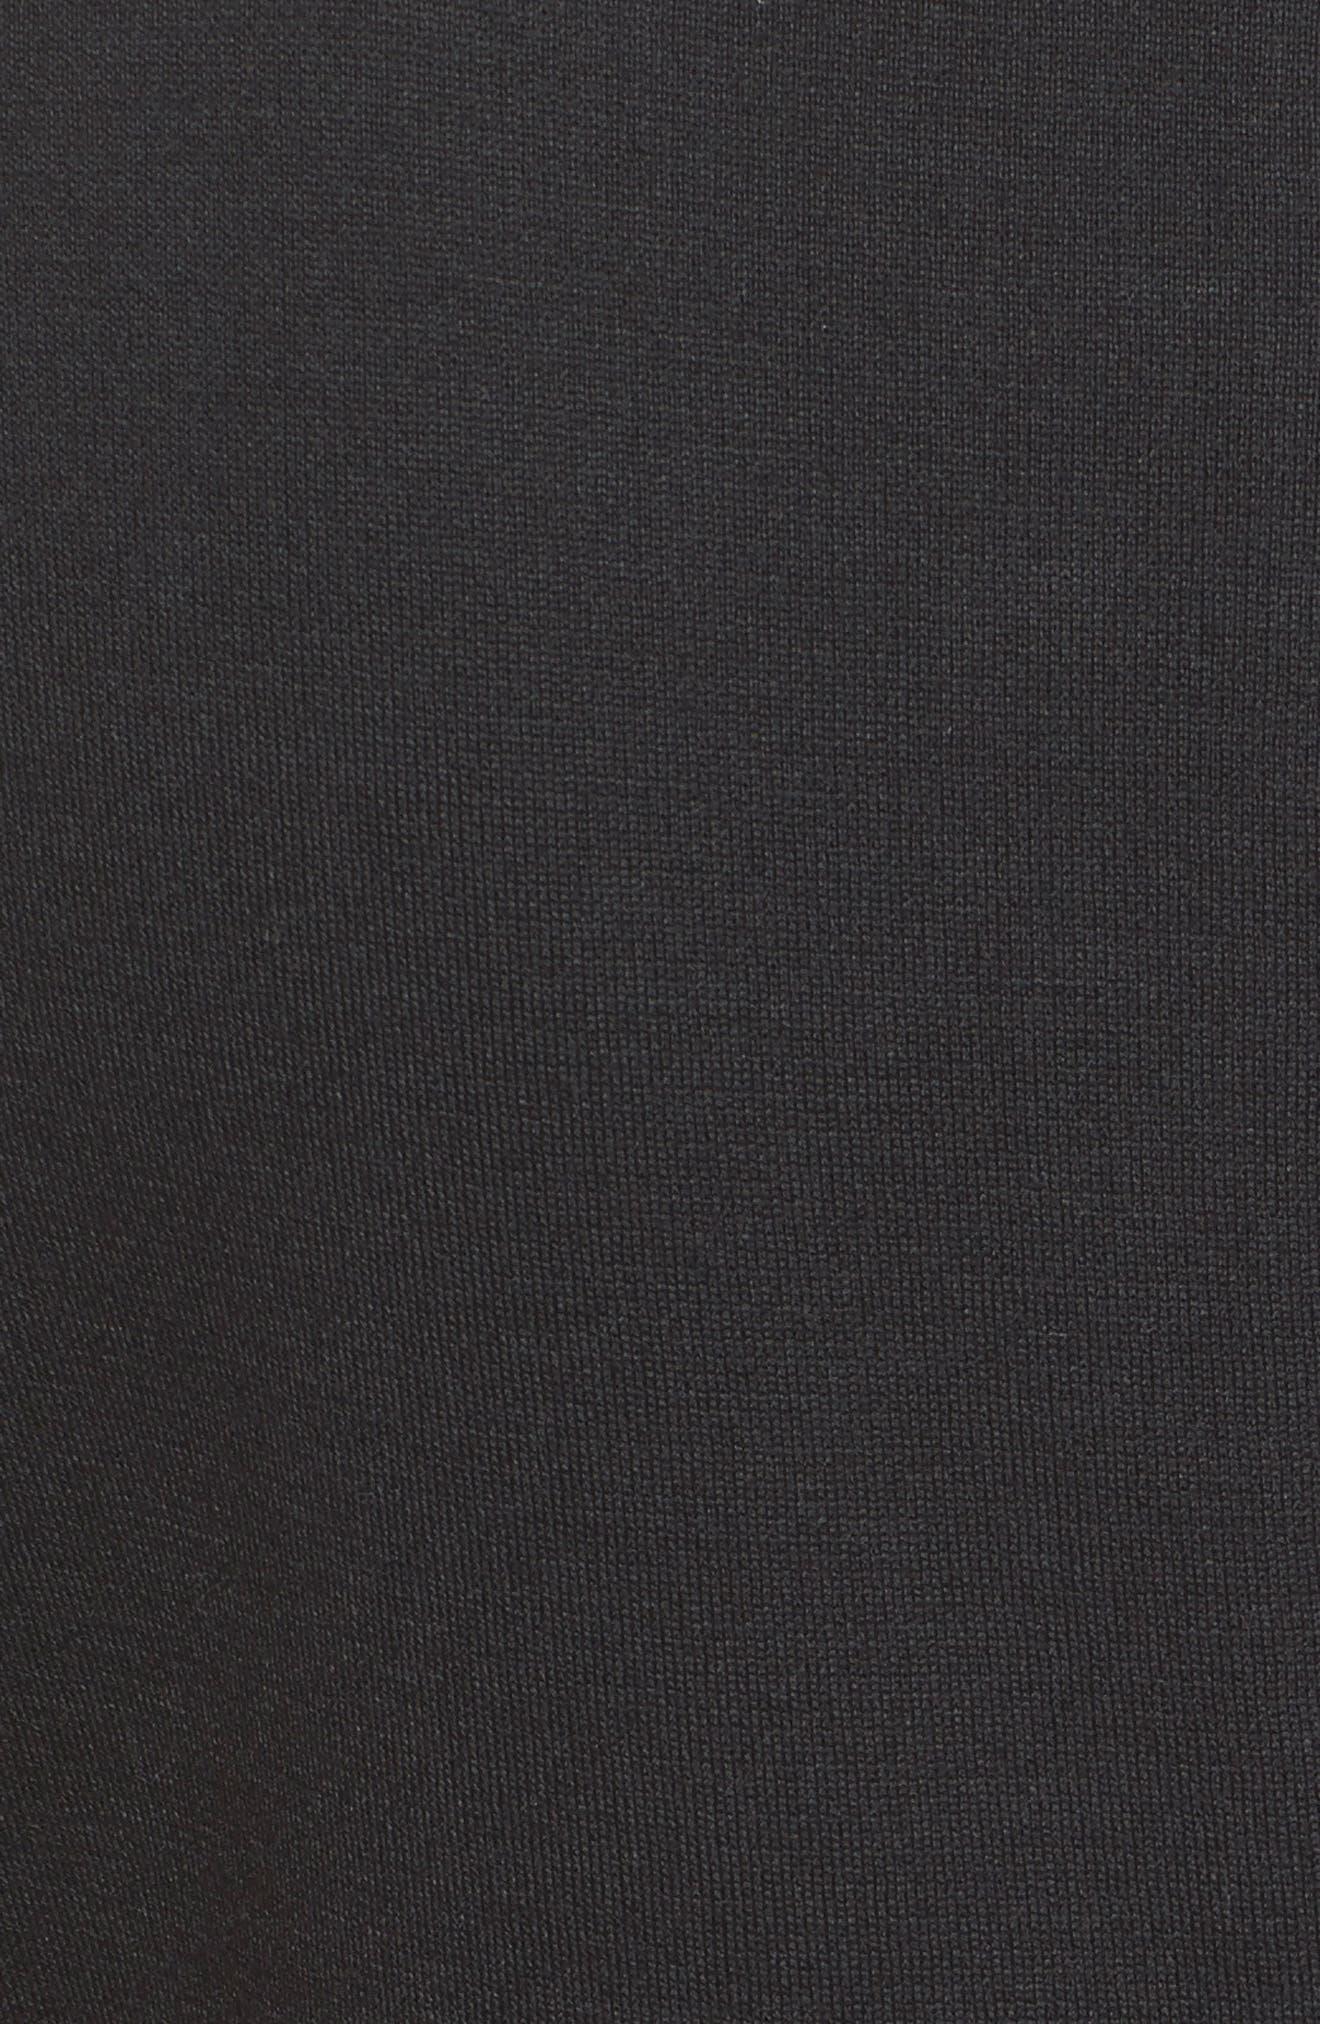 ST. JOHN COLLECTION, Milano Knit Sheath Dress, Alternate thumbnail 6, color, CAVIAR